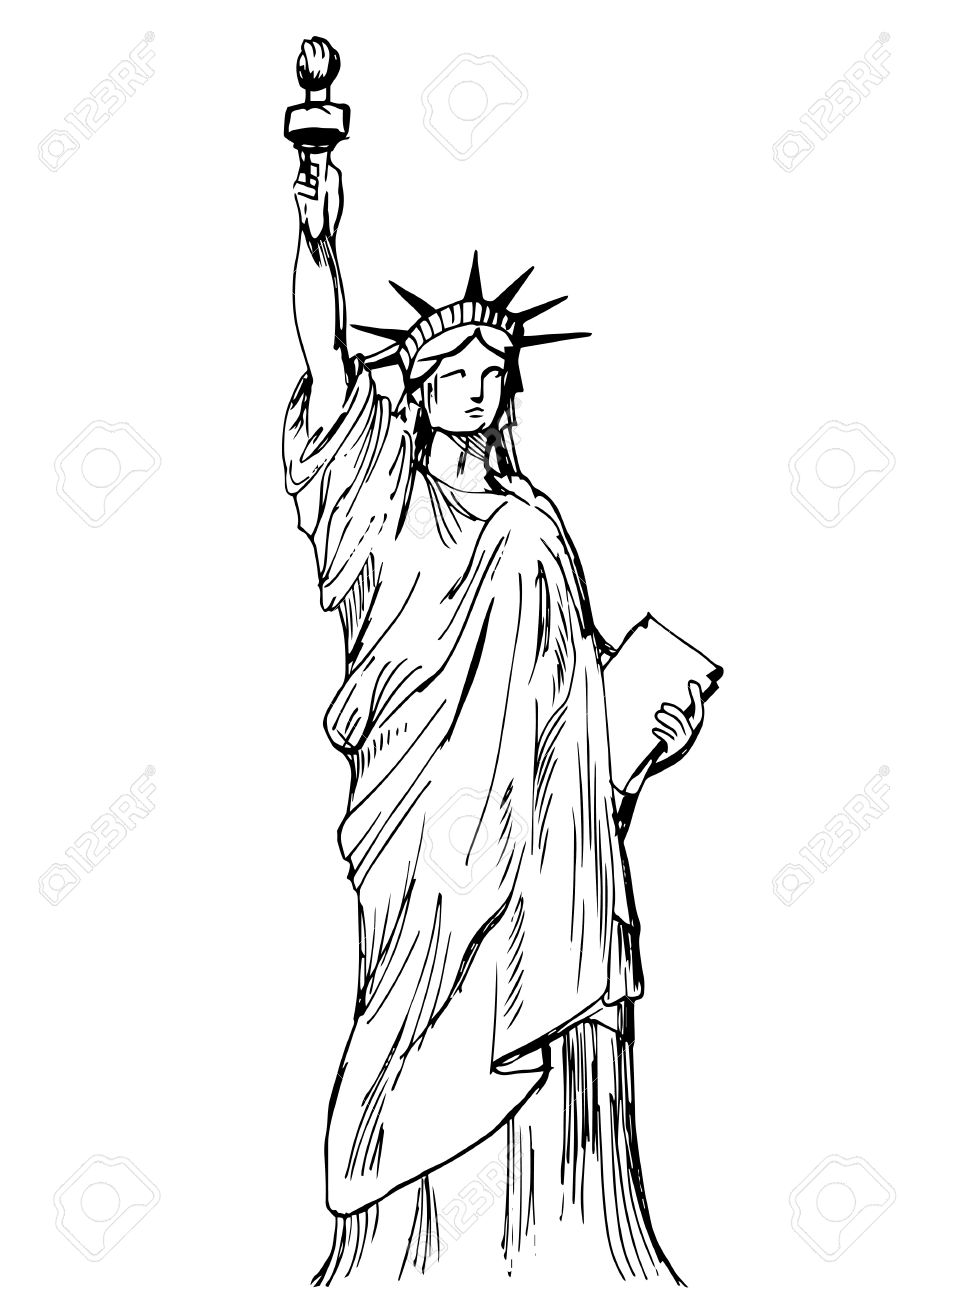 975x1300 Hand Drawn Liberty Statue